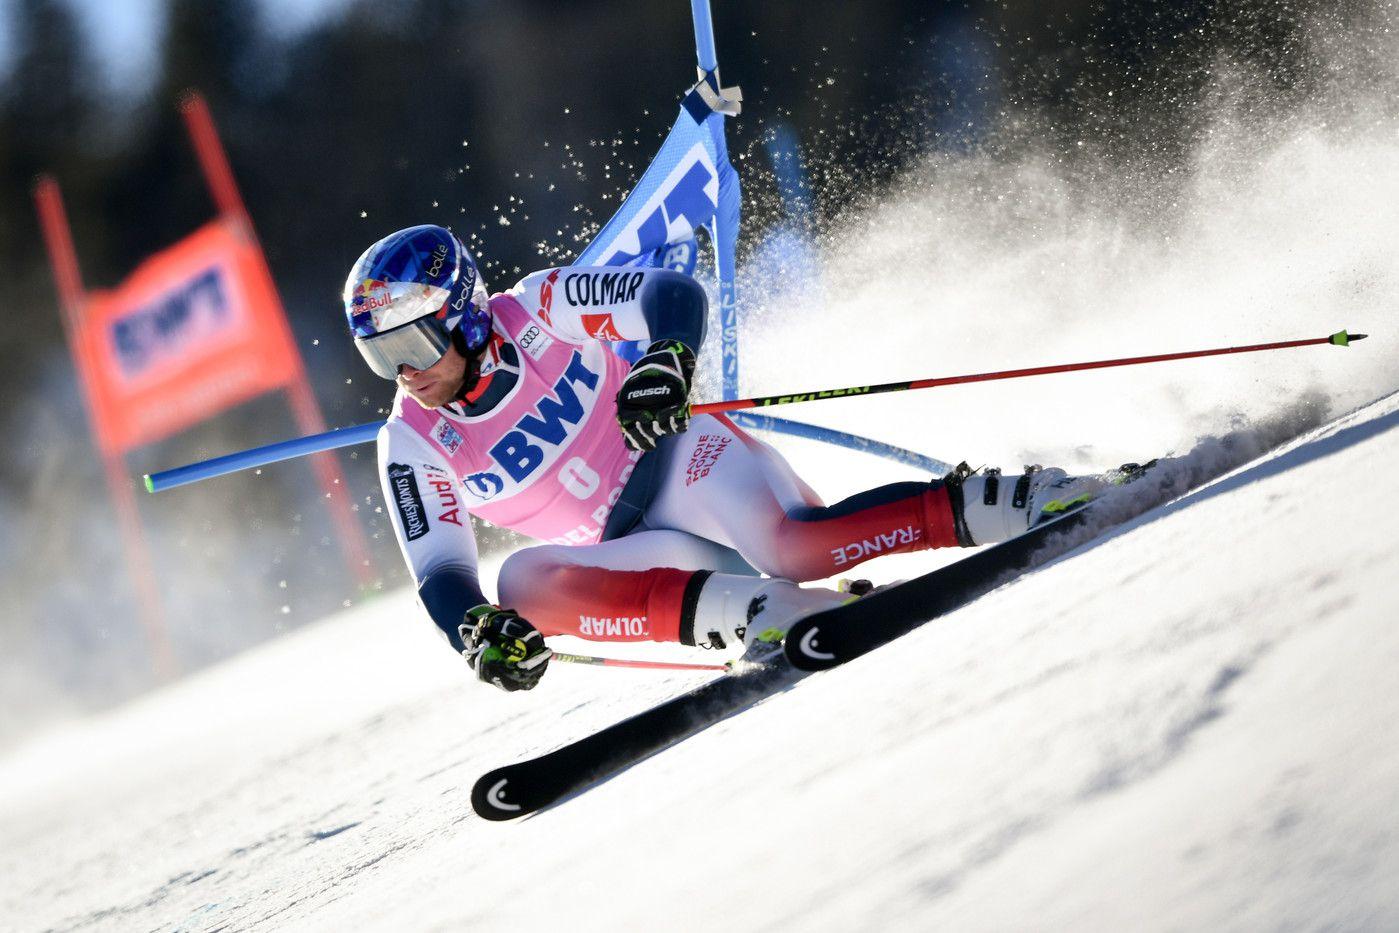 Coupe du monde de ski alpin 2019 2020